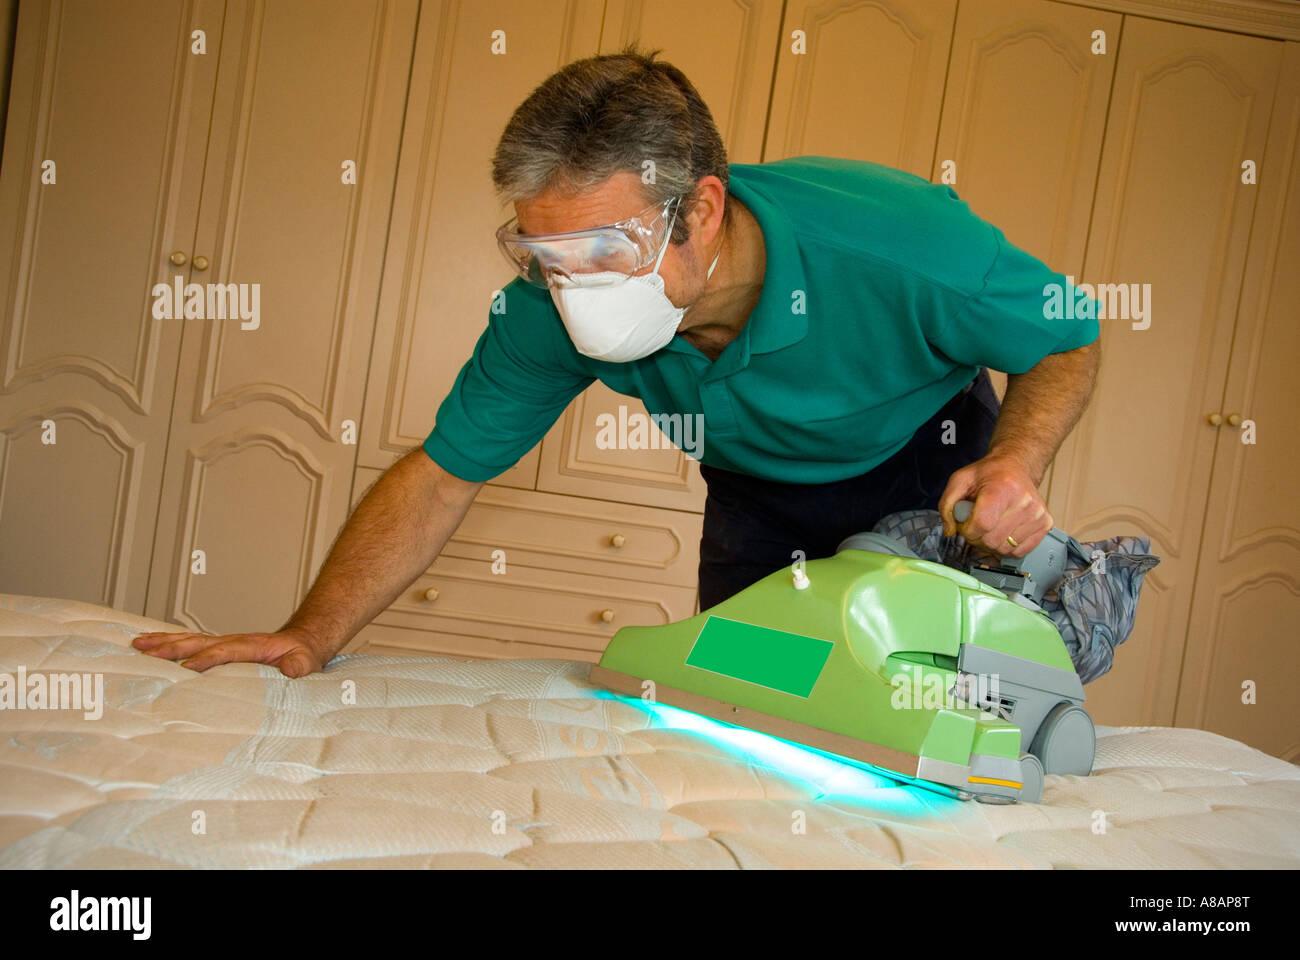 Technician Operating Specialist Uv Dust Mite Vacuum To